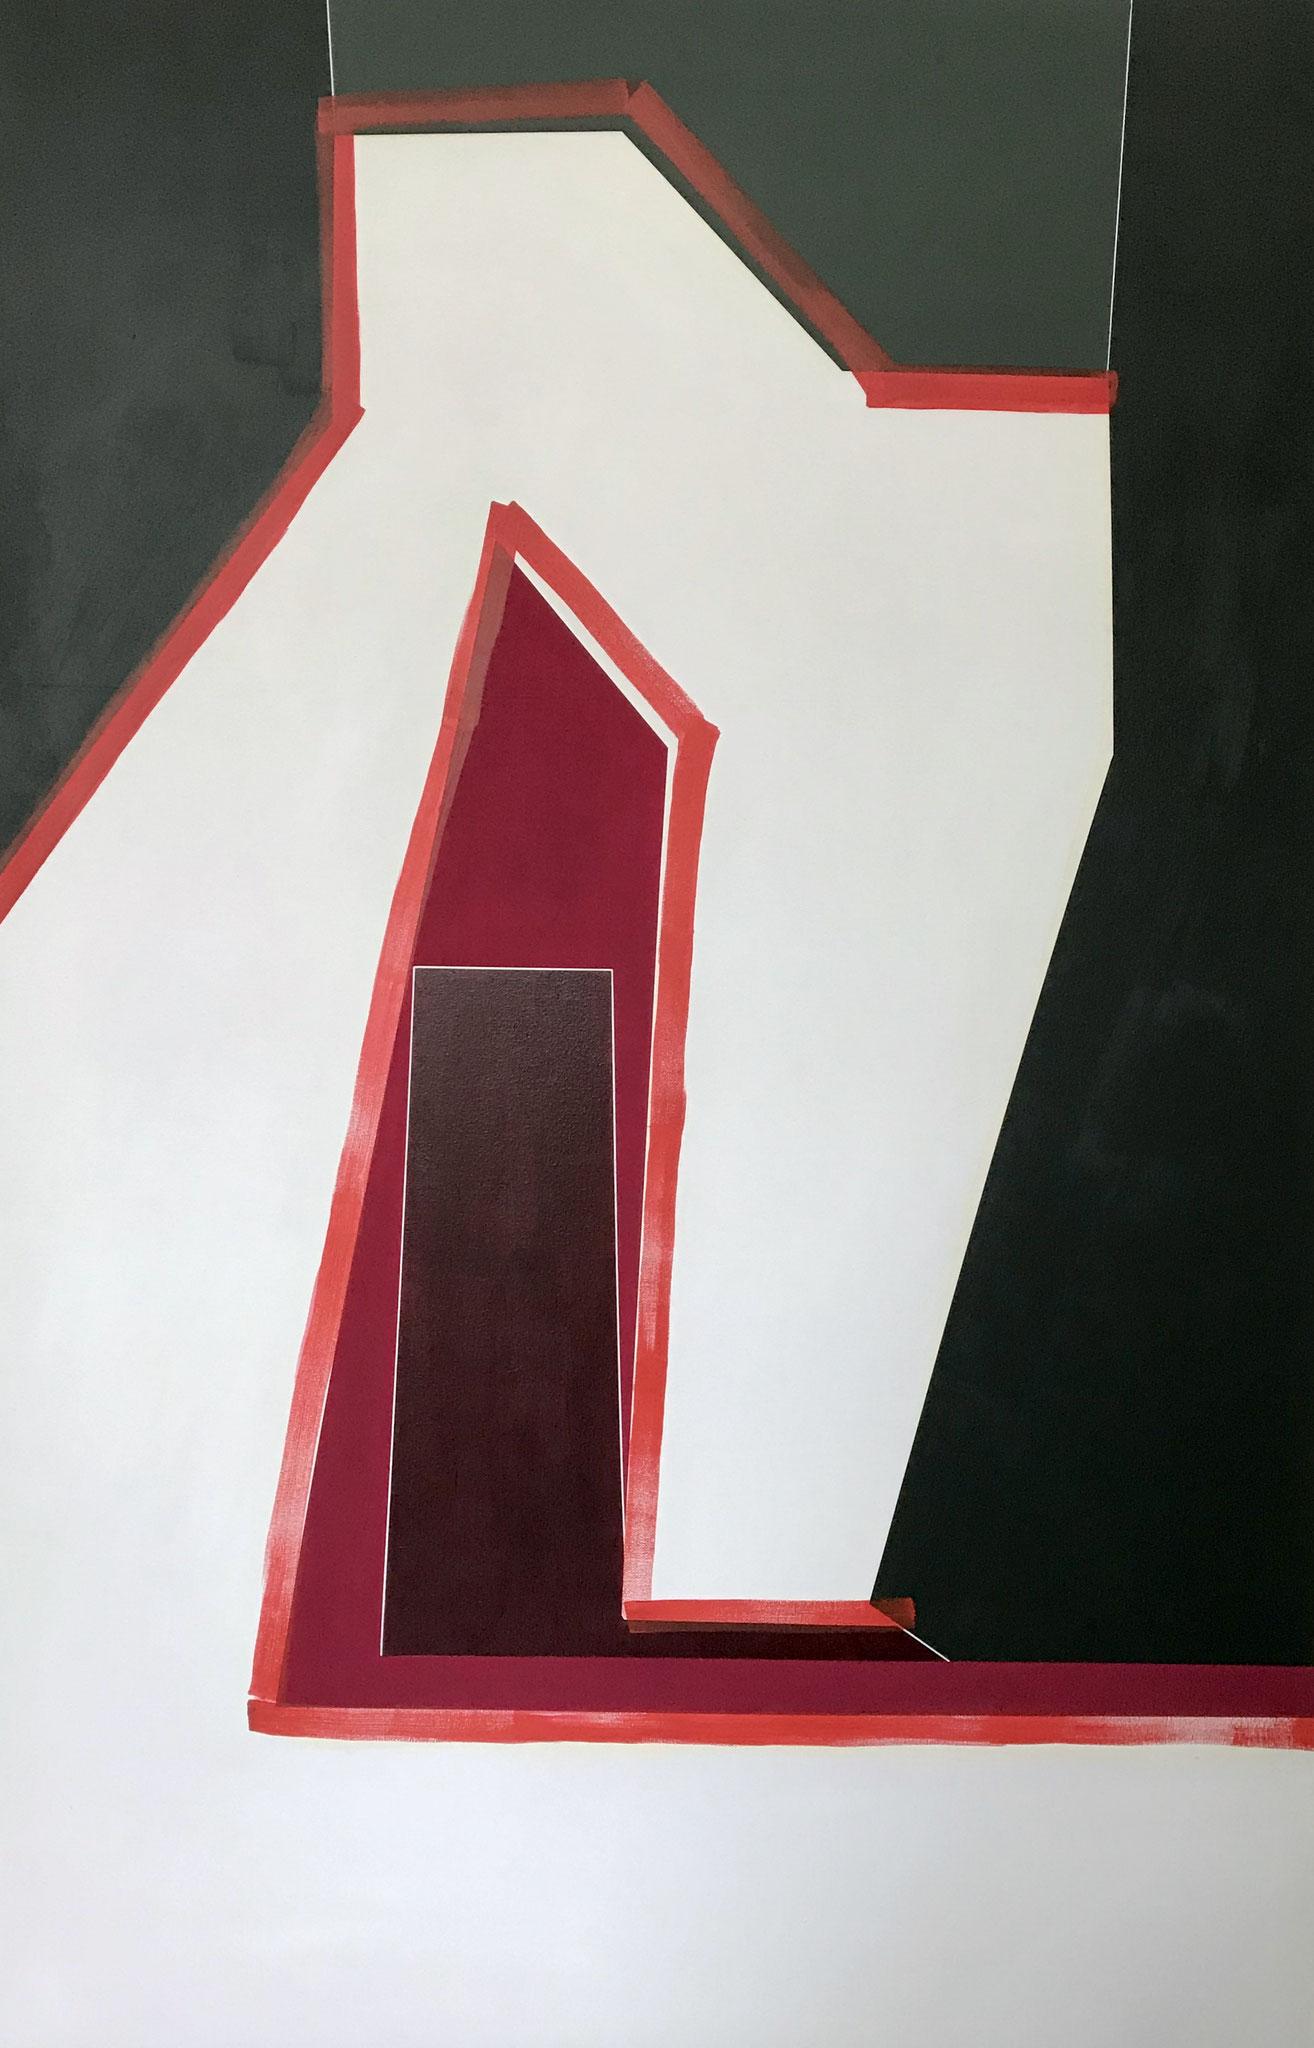 o.T., Acryl auf Leinwand, 200 x 120cm, 2019